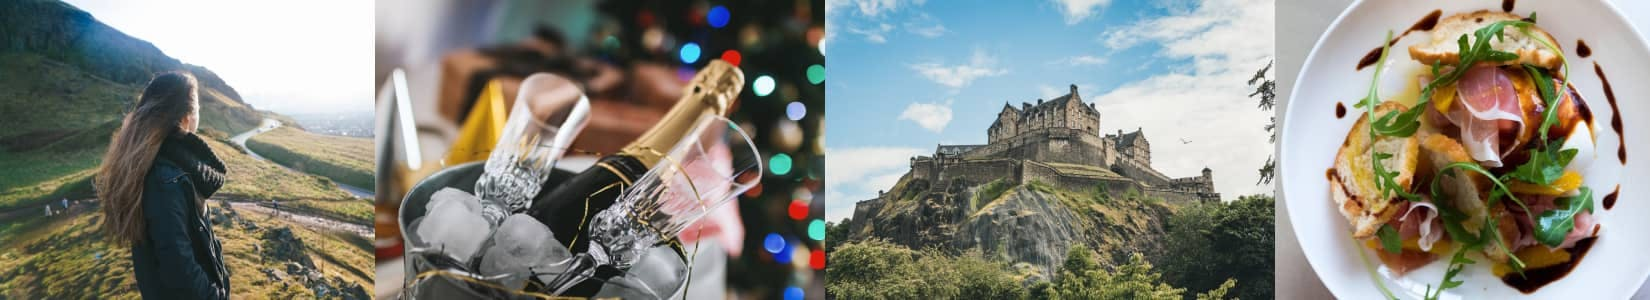 Edinburgh City Collage of Photographs